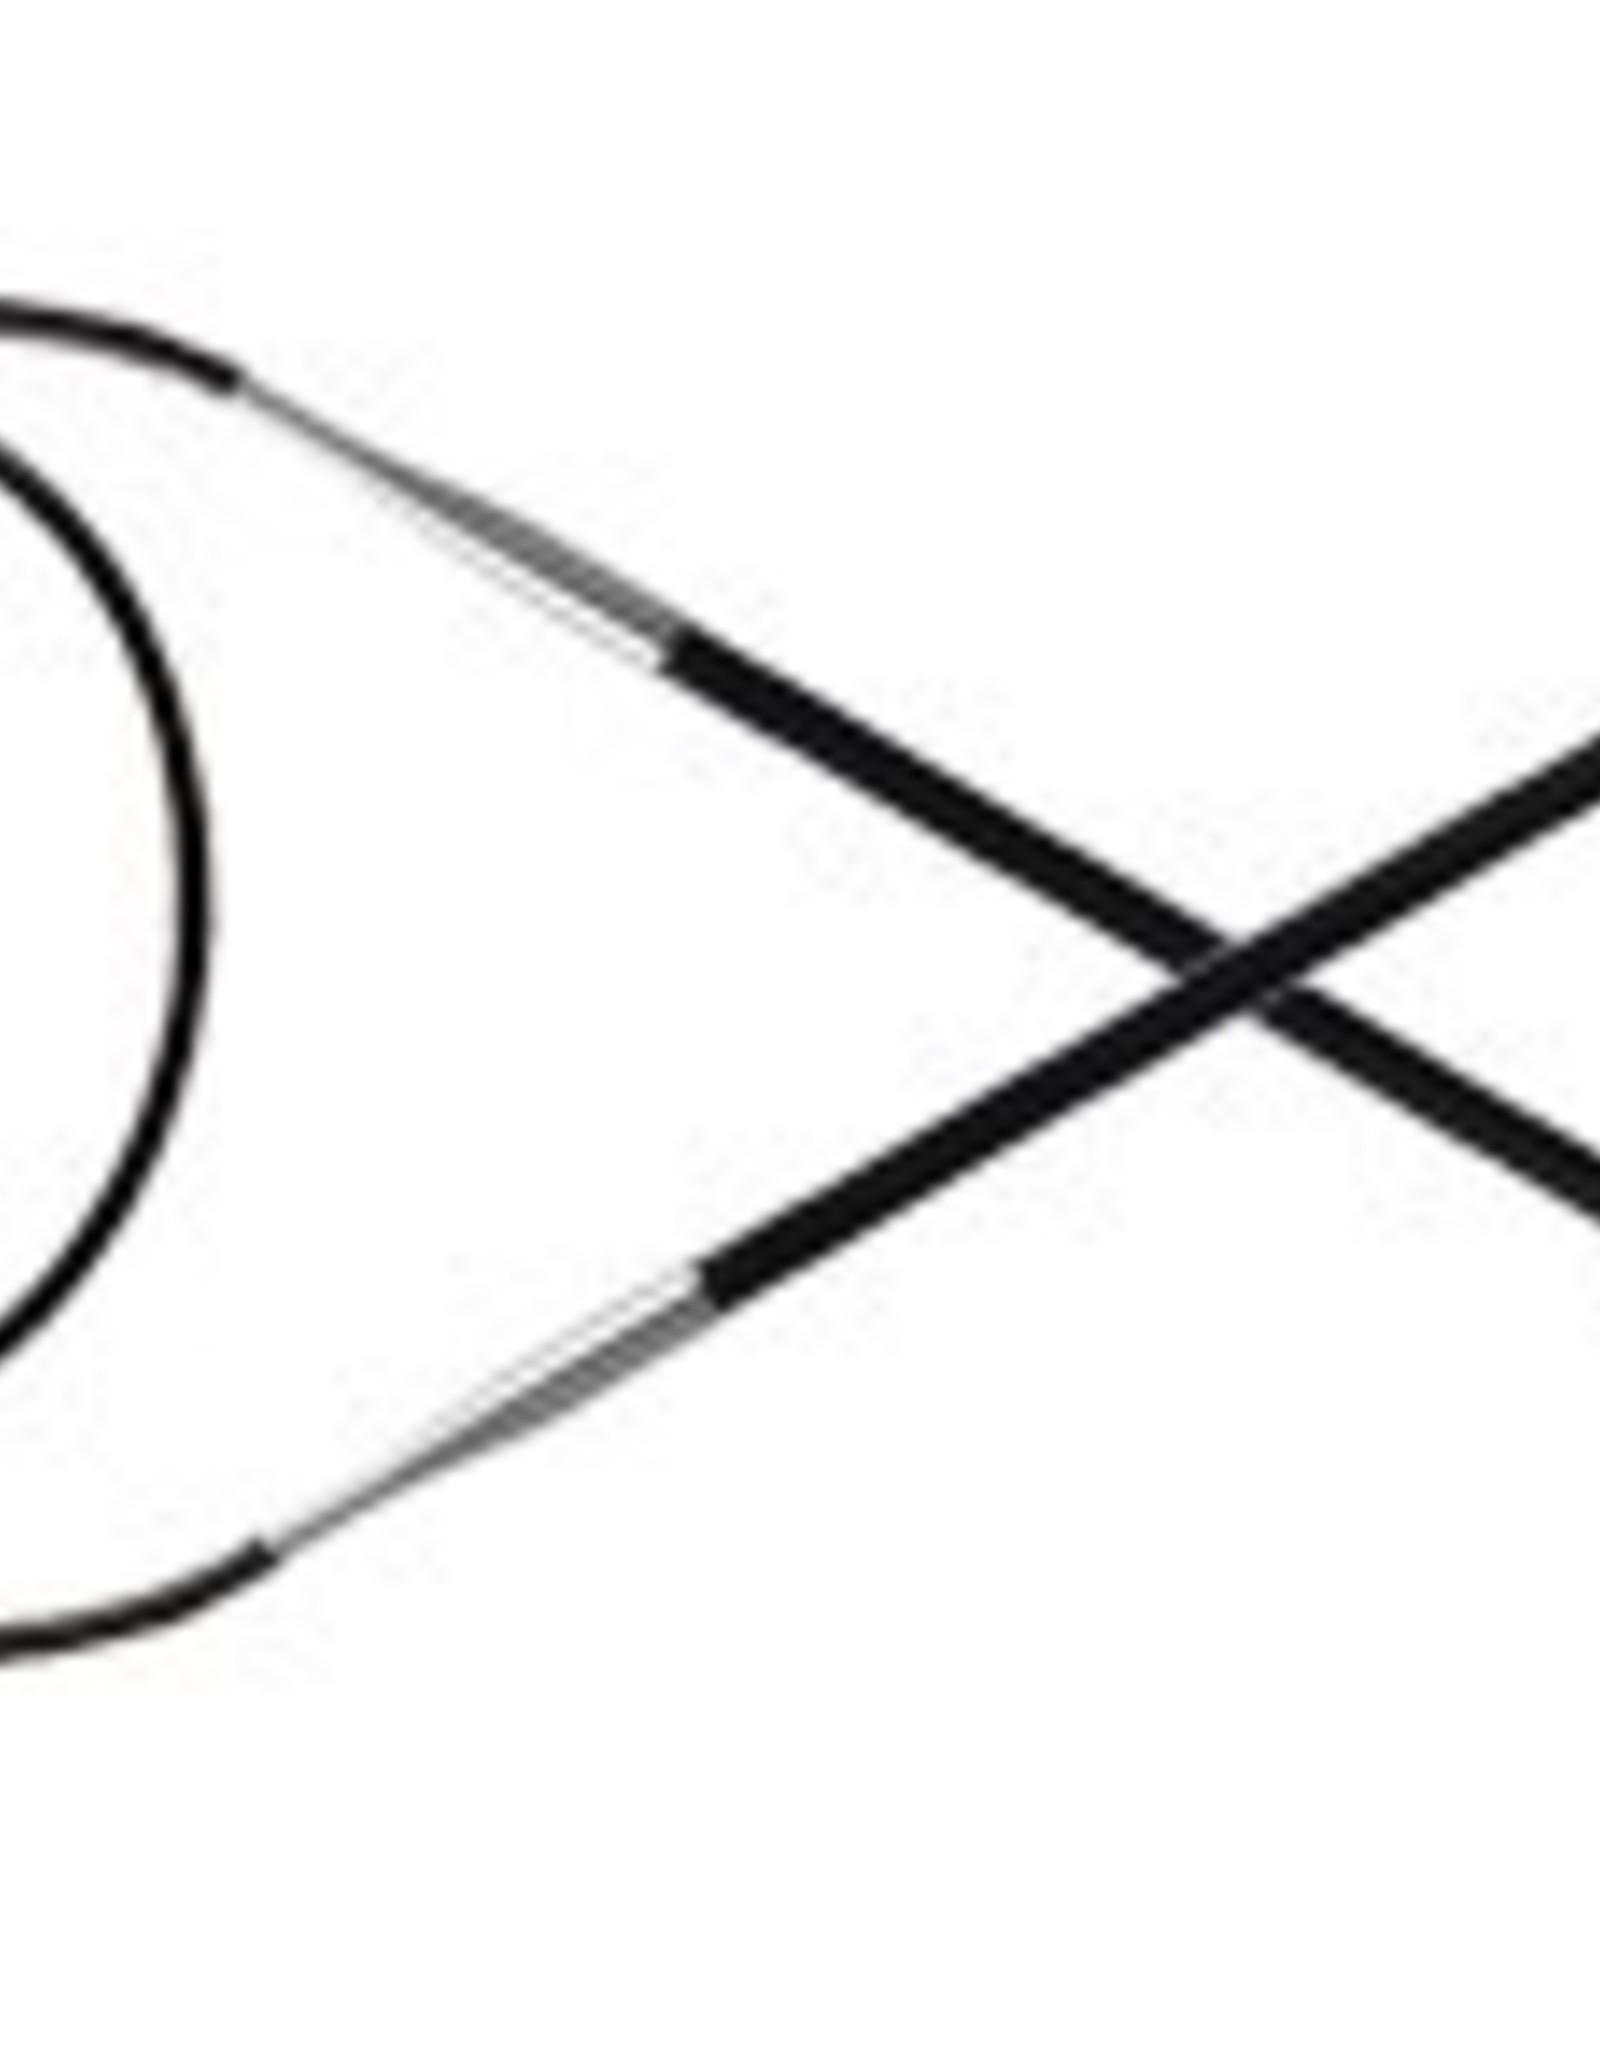 Knitter's Pride 3 Karbonz Circular 16